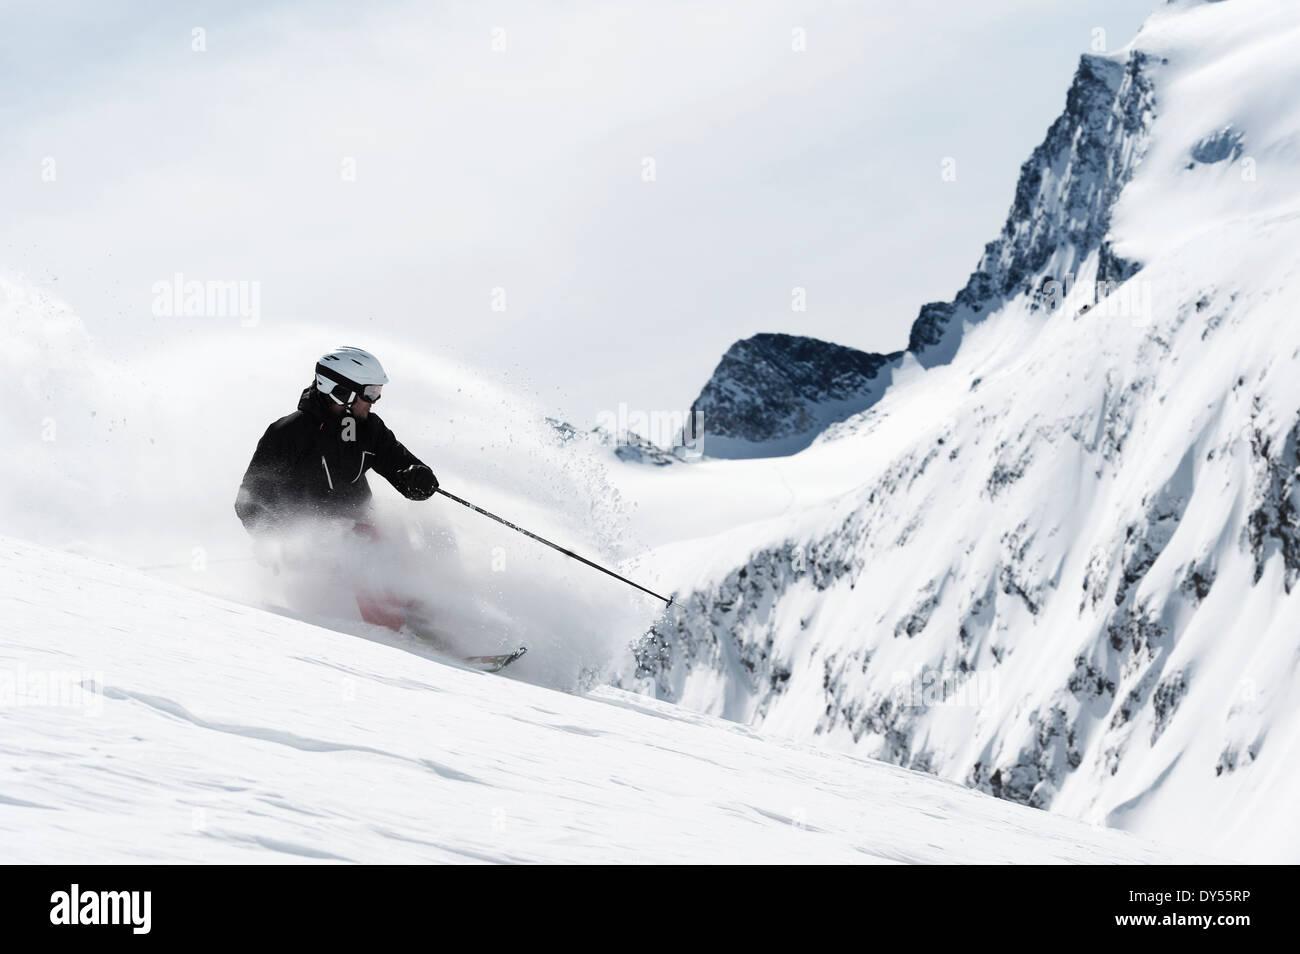 Mid adult man skiing downhill, Obergurgl, Austria - Stock Image